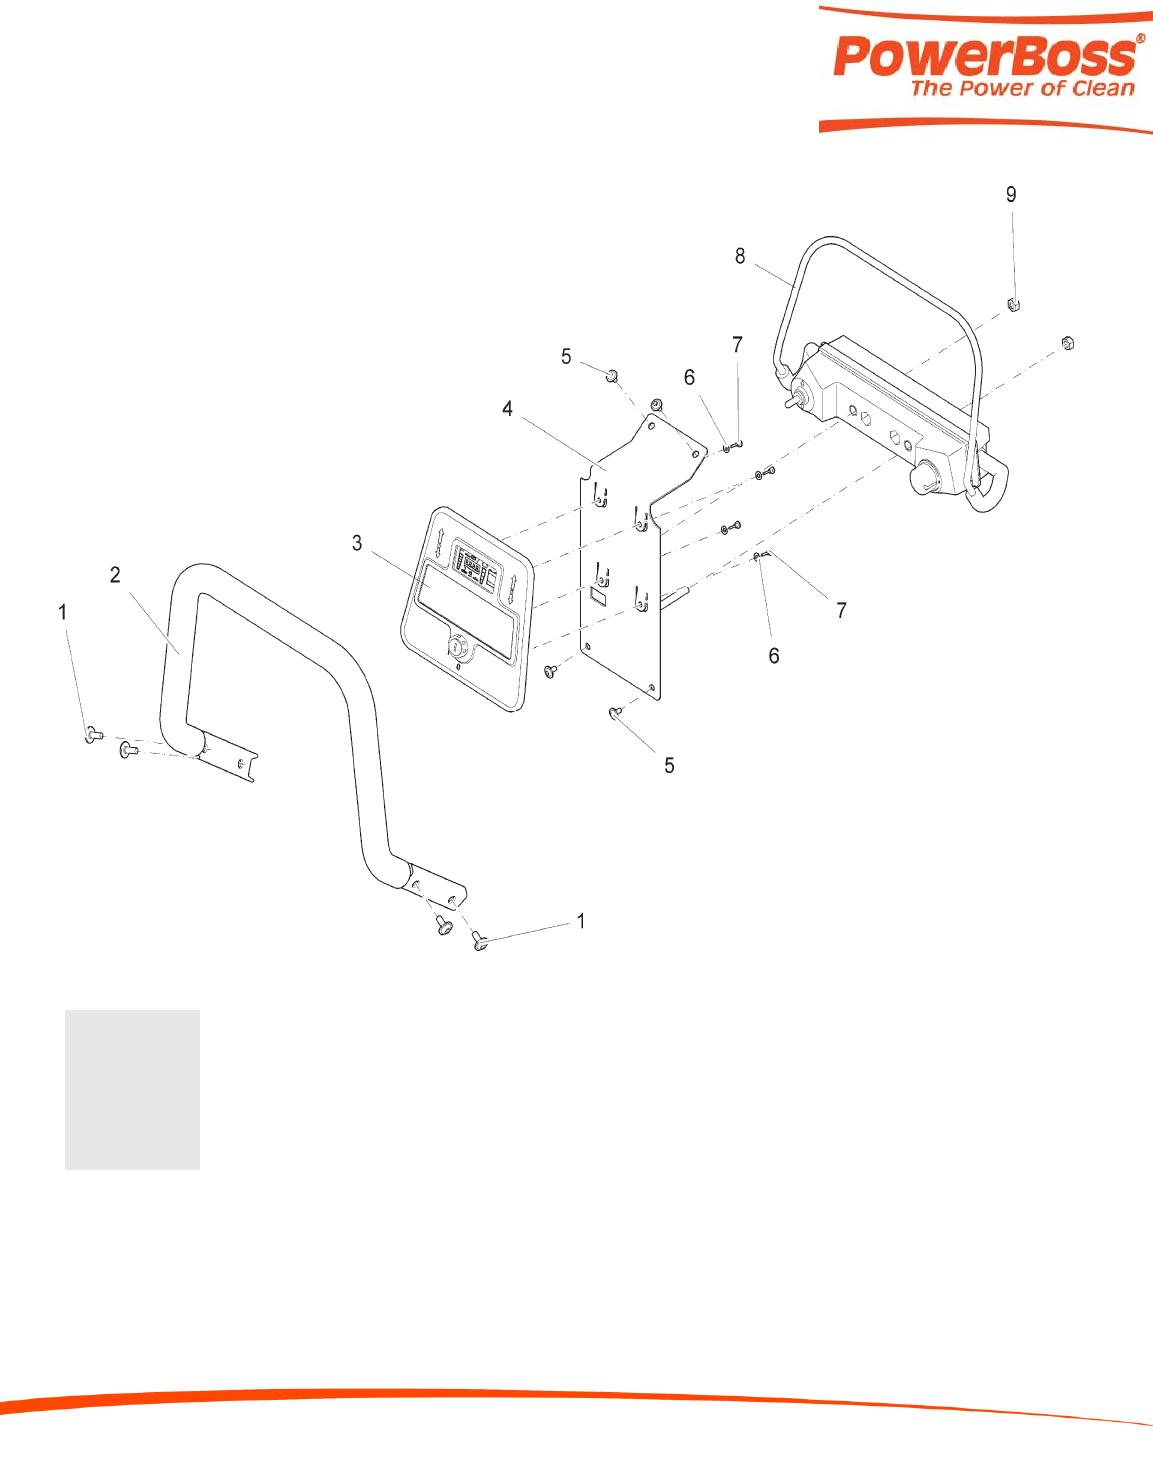 988026PB Parts Manual PHX26 Floor Scrubber REV D 0613.pmd